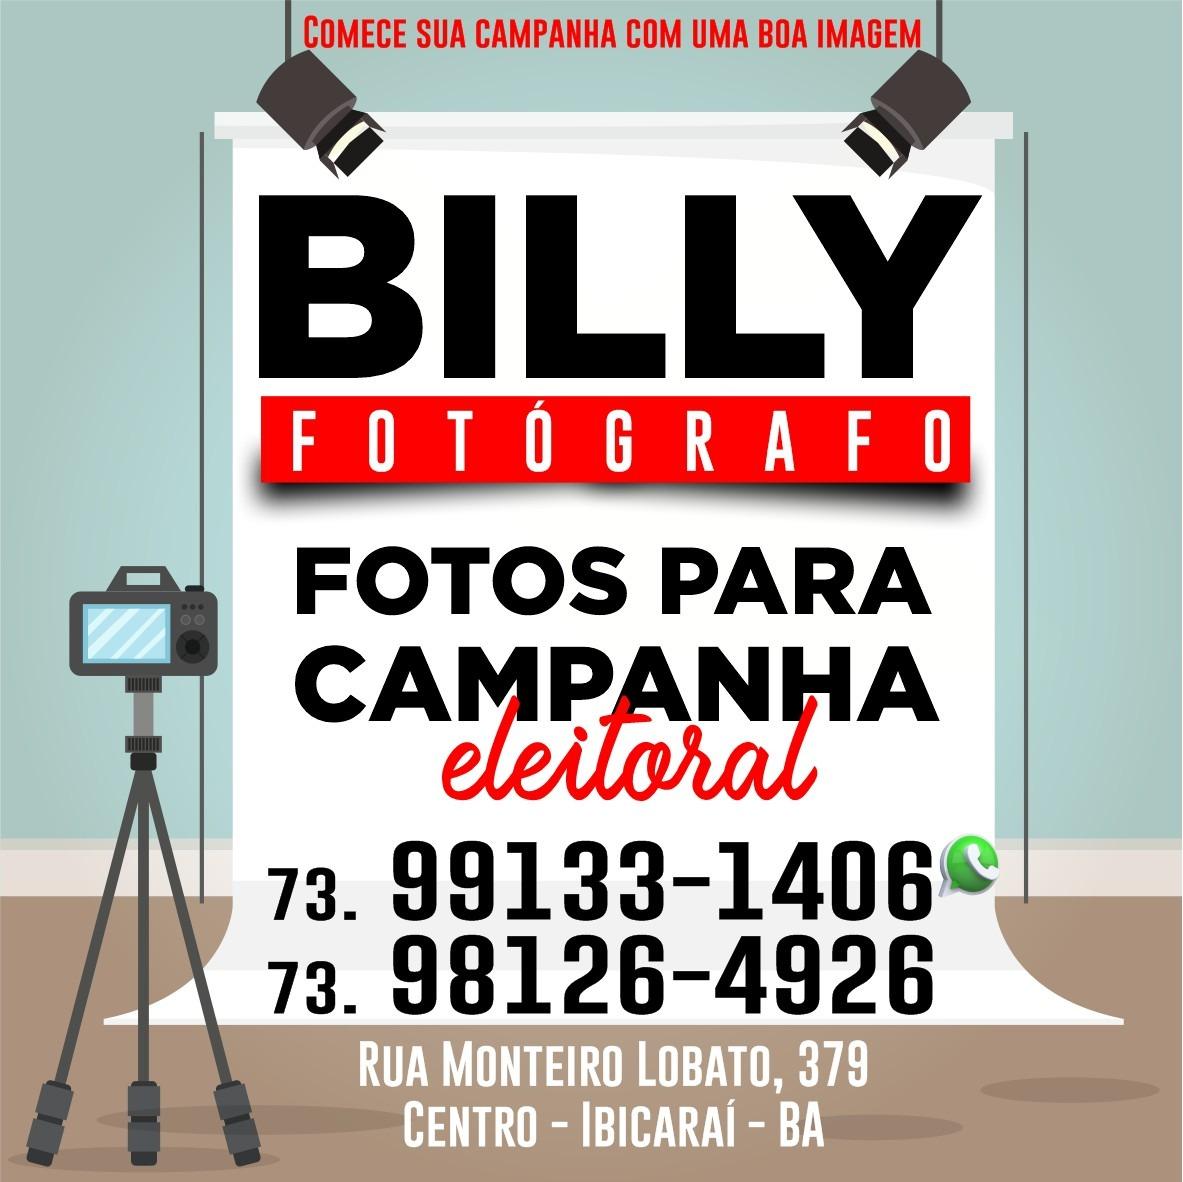 BILLY FOTOGRAFO